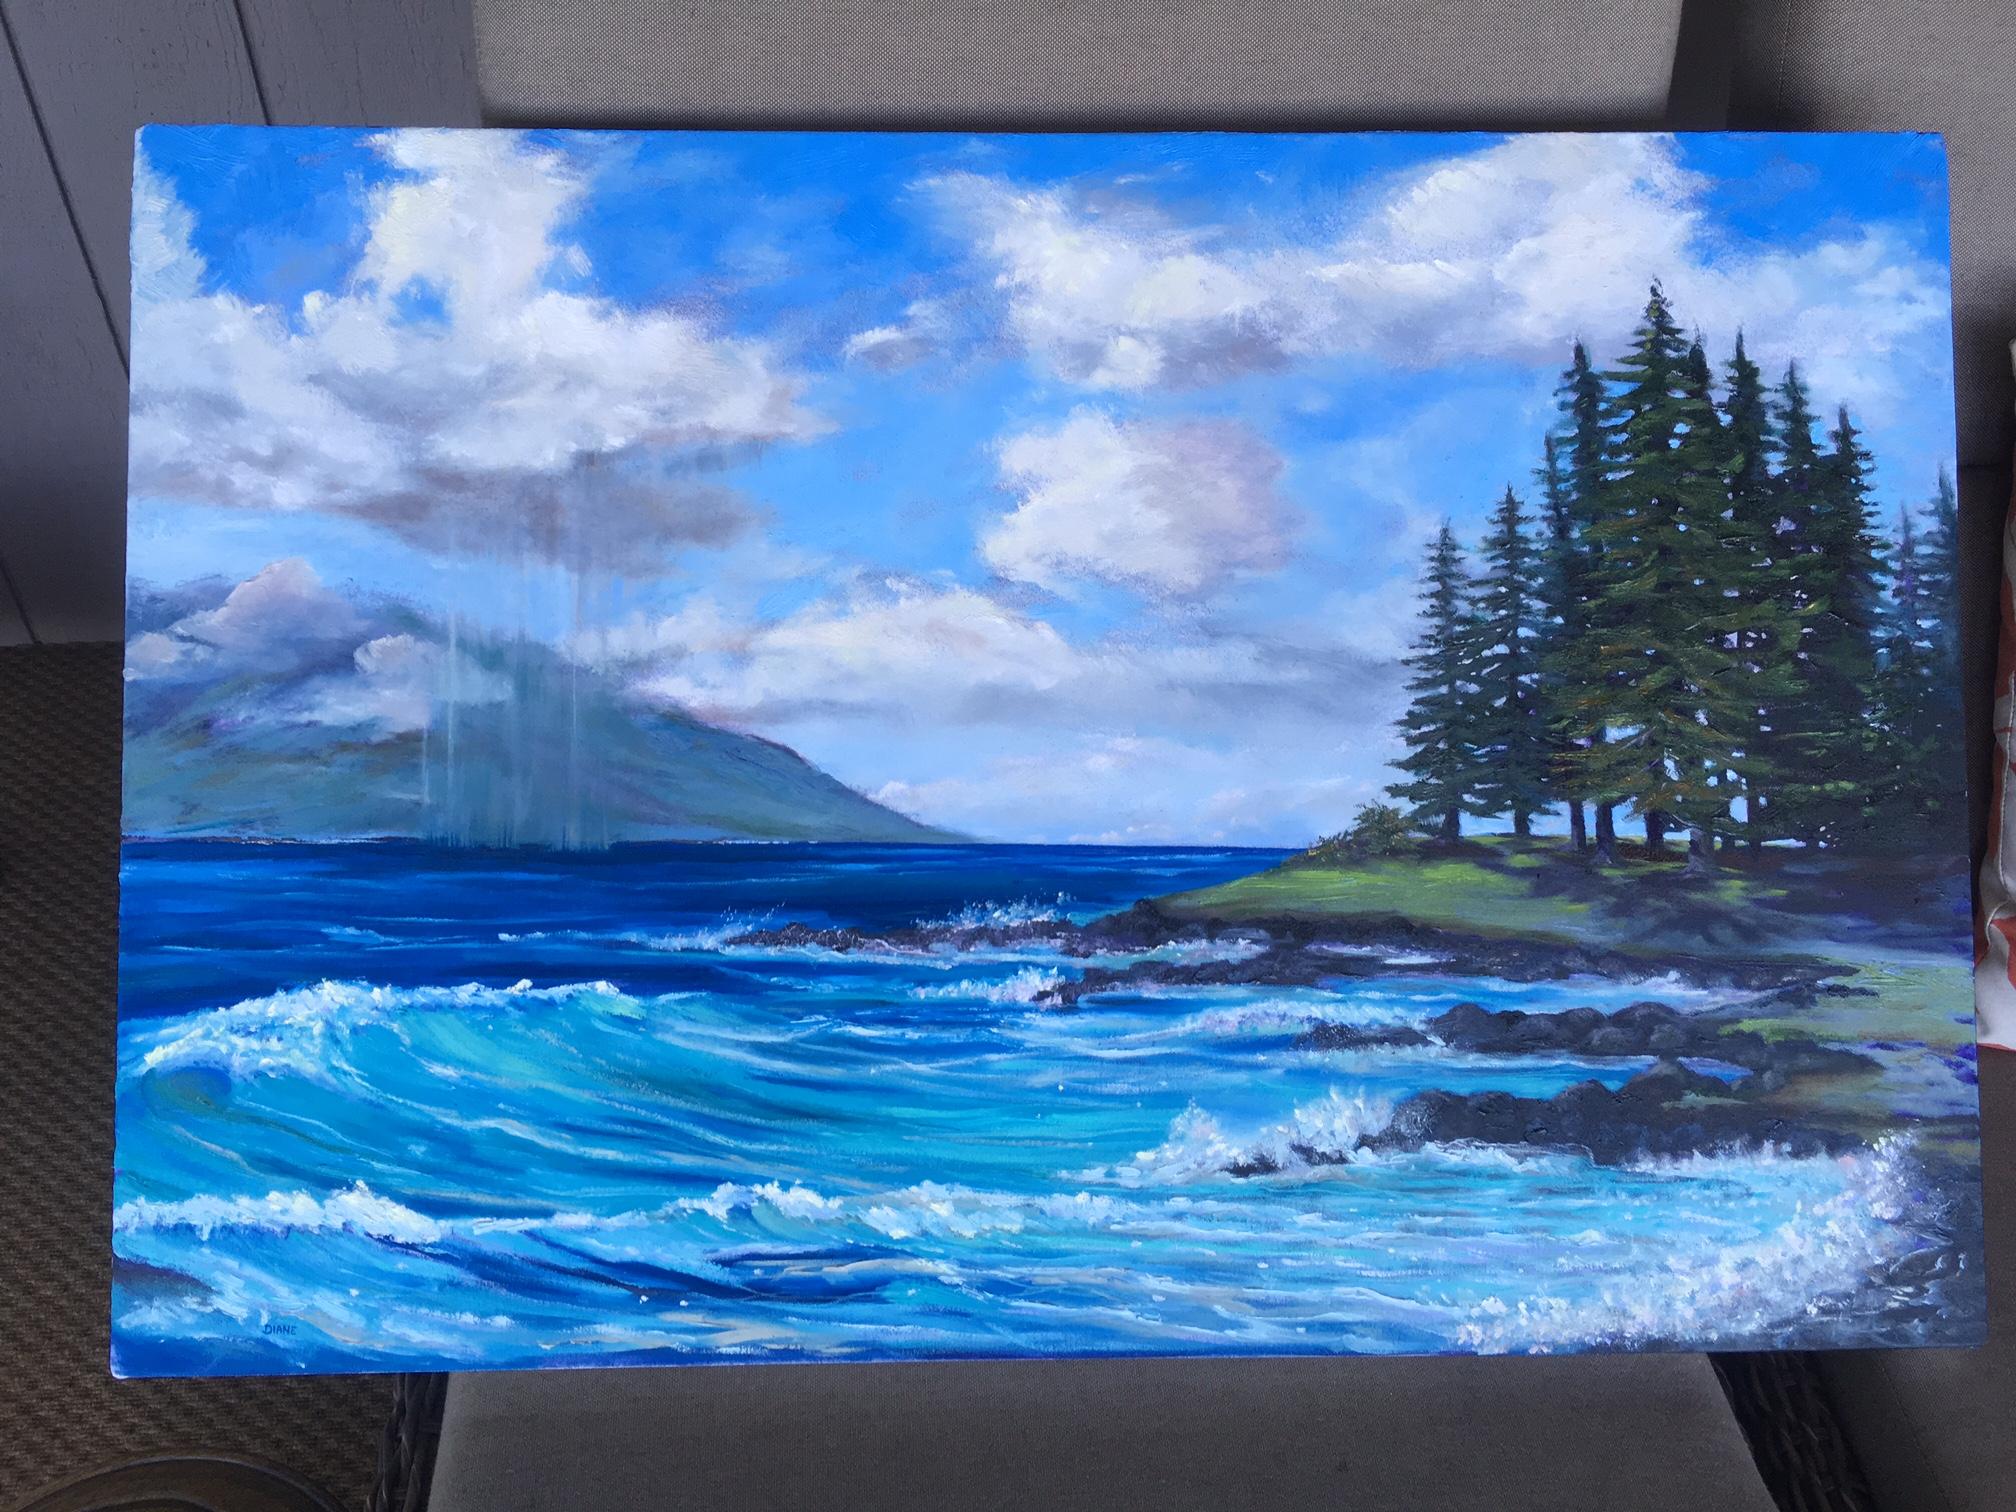 Mary's View- Kapalua Pines 36 x 24